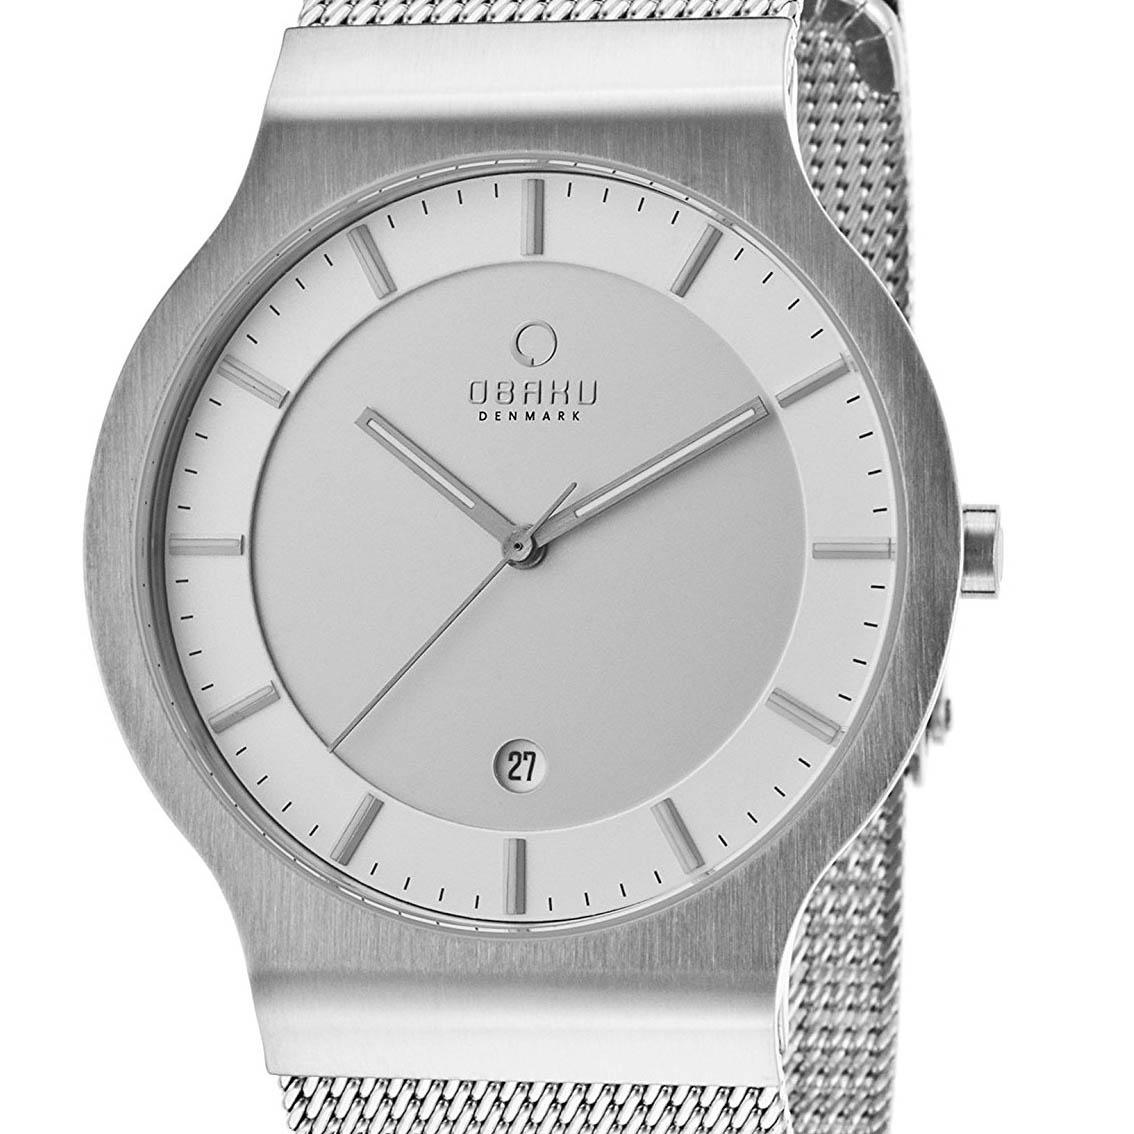 OBAKU オバック クォーツ 腕時計 デンマーク シンプル 薄型 ファッション [V133XCIMC1] 並行輸入品 純正ケース メーカー保証